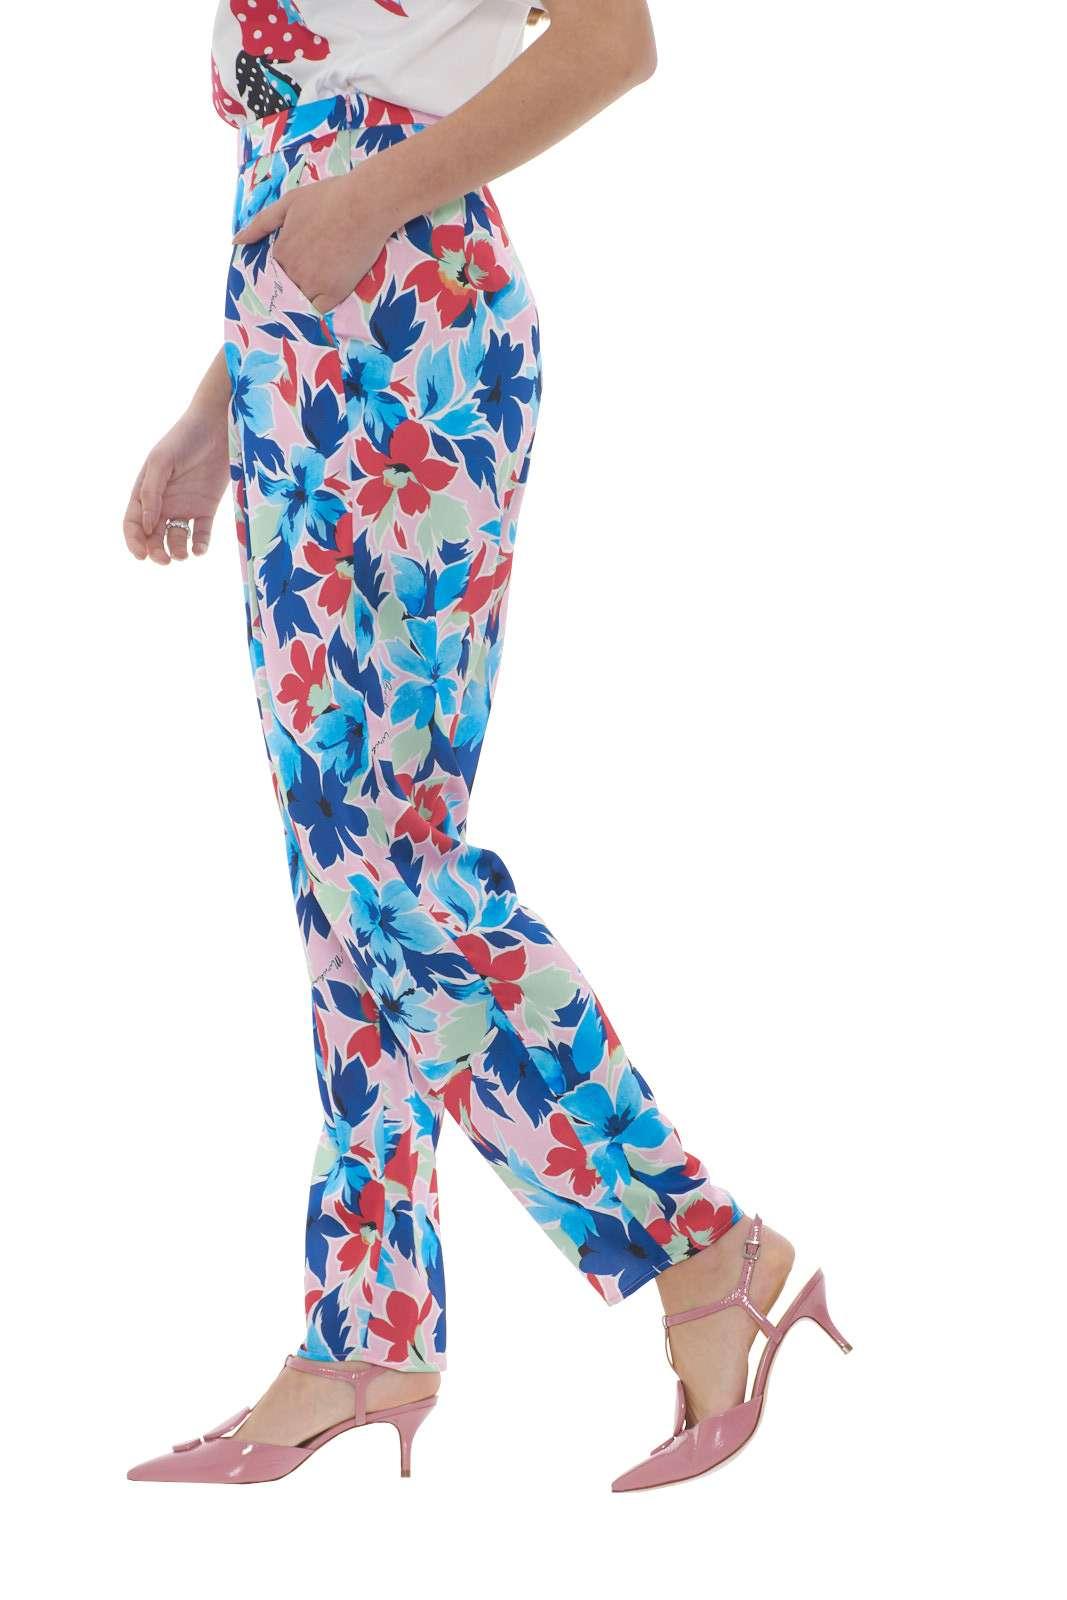 https://www.parmax.com/media/catalog/product/a/i/PE-outlet_parmax-pantaloni-donna-Moschino-a0302%201152-B.jpg